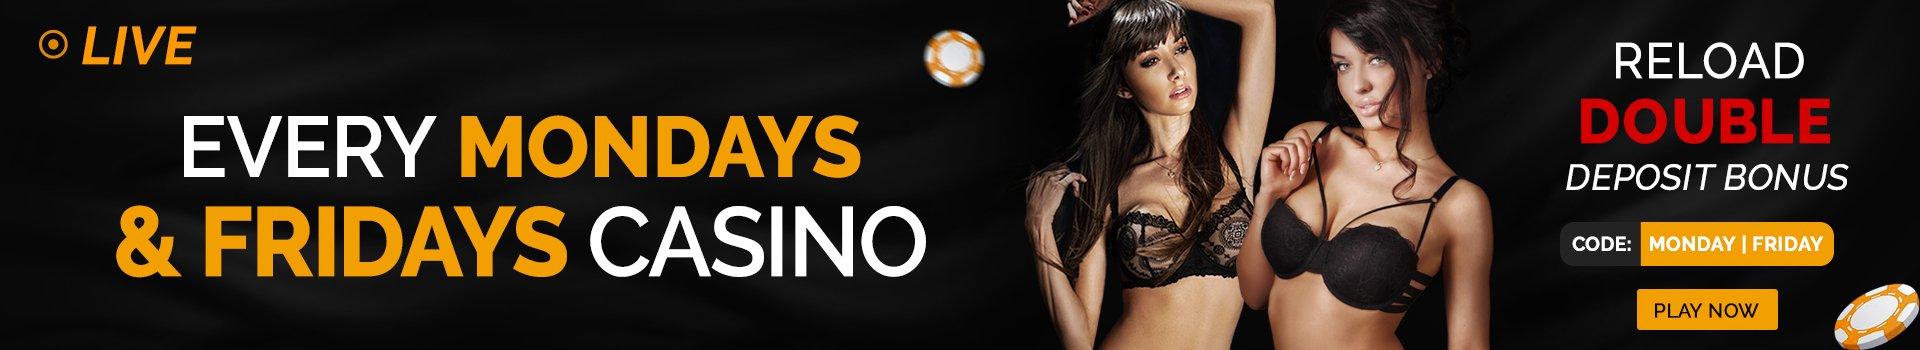 PornHub-Casino-Mondays-Bonuses